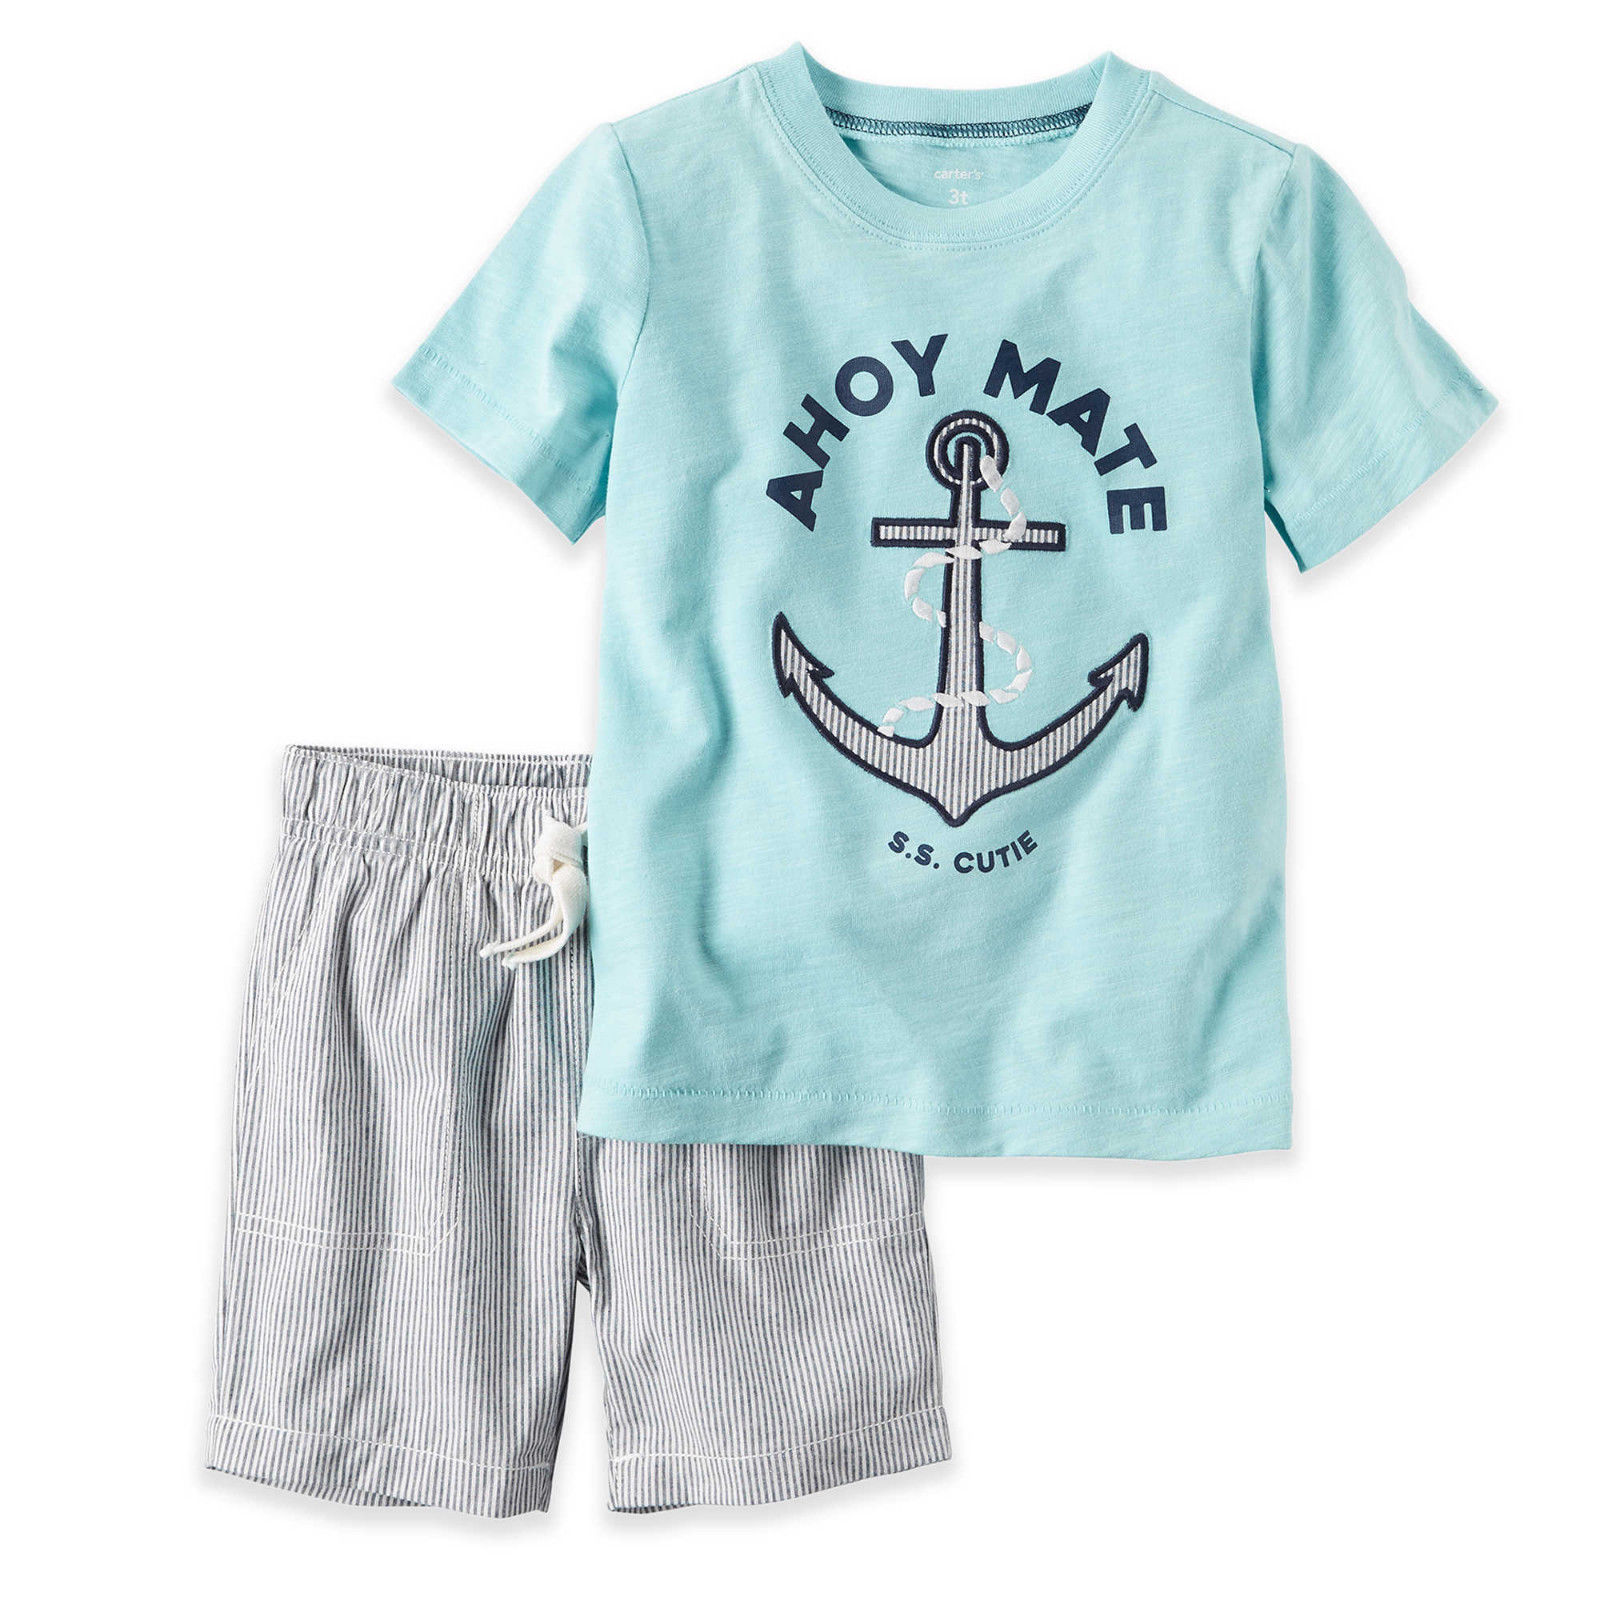 e9456a73861be Carter's Infant Boys 2pc T-Shirt& Shorts Set and 50 similar items